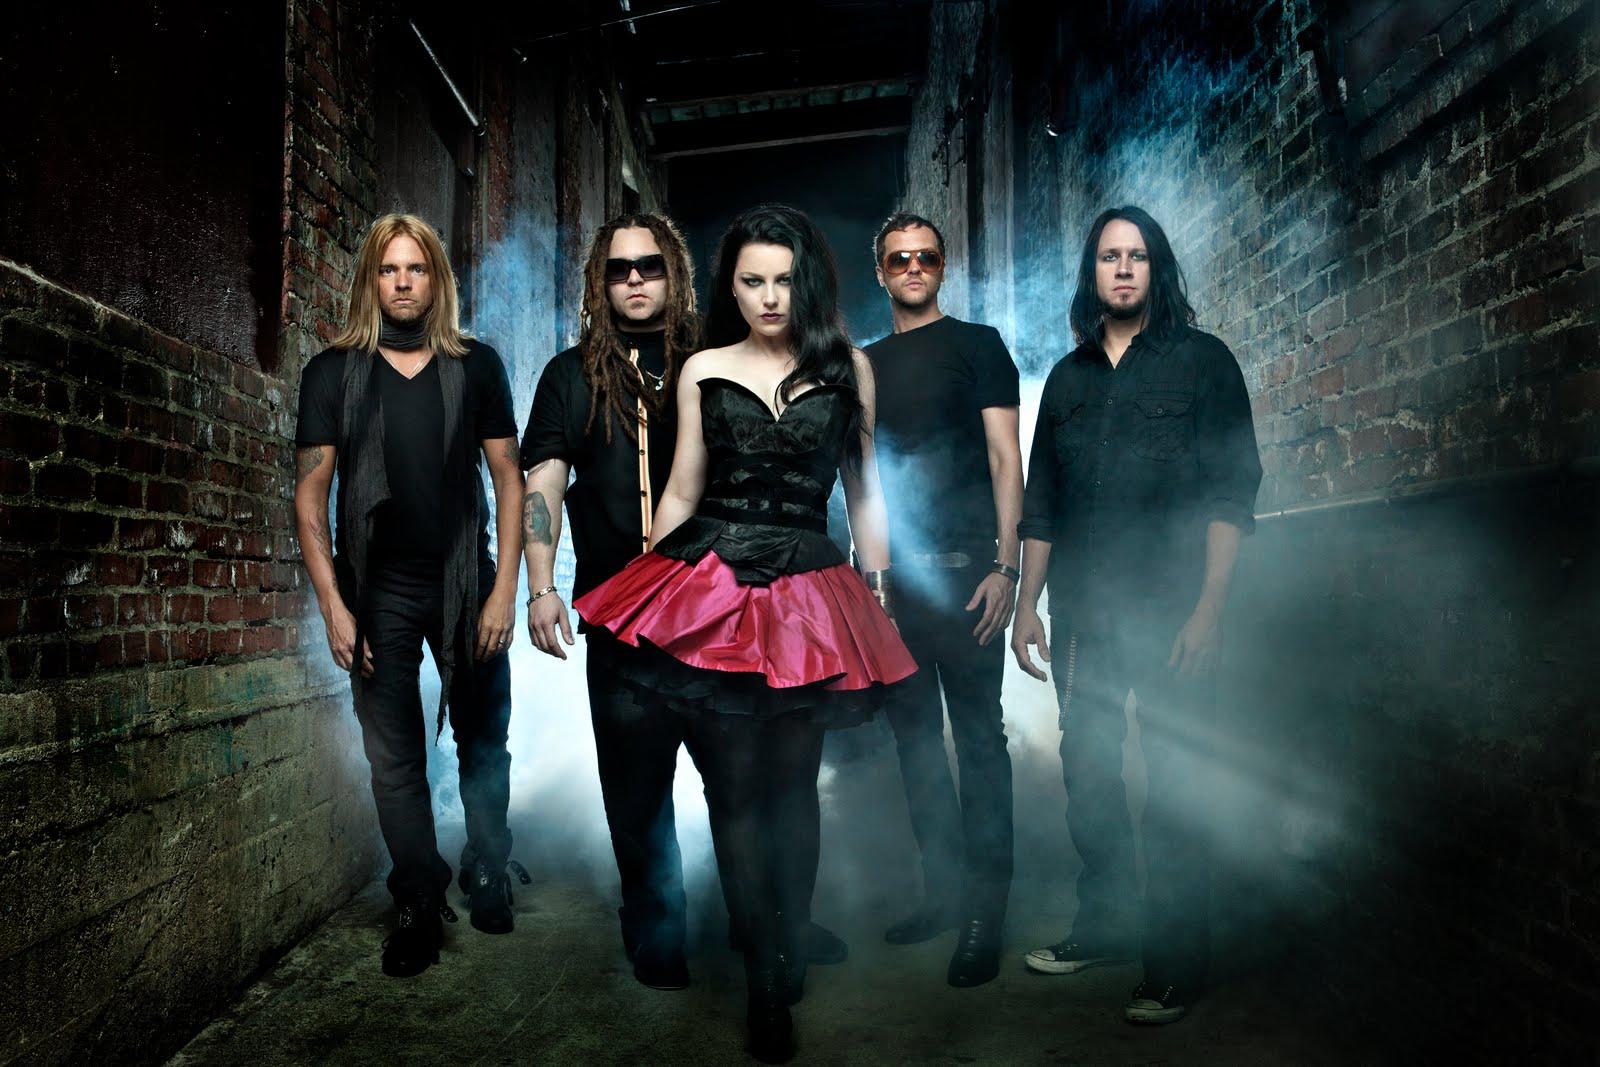 http://4.bp.blogspot.com/-2bJFghgCtaM/TyLBXRbTu0I/AAAAAAAAGNE/owjEH5R_KMA/s1600/Evanescence+2011.jpg